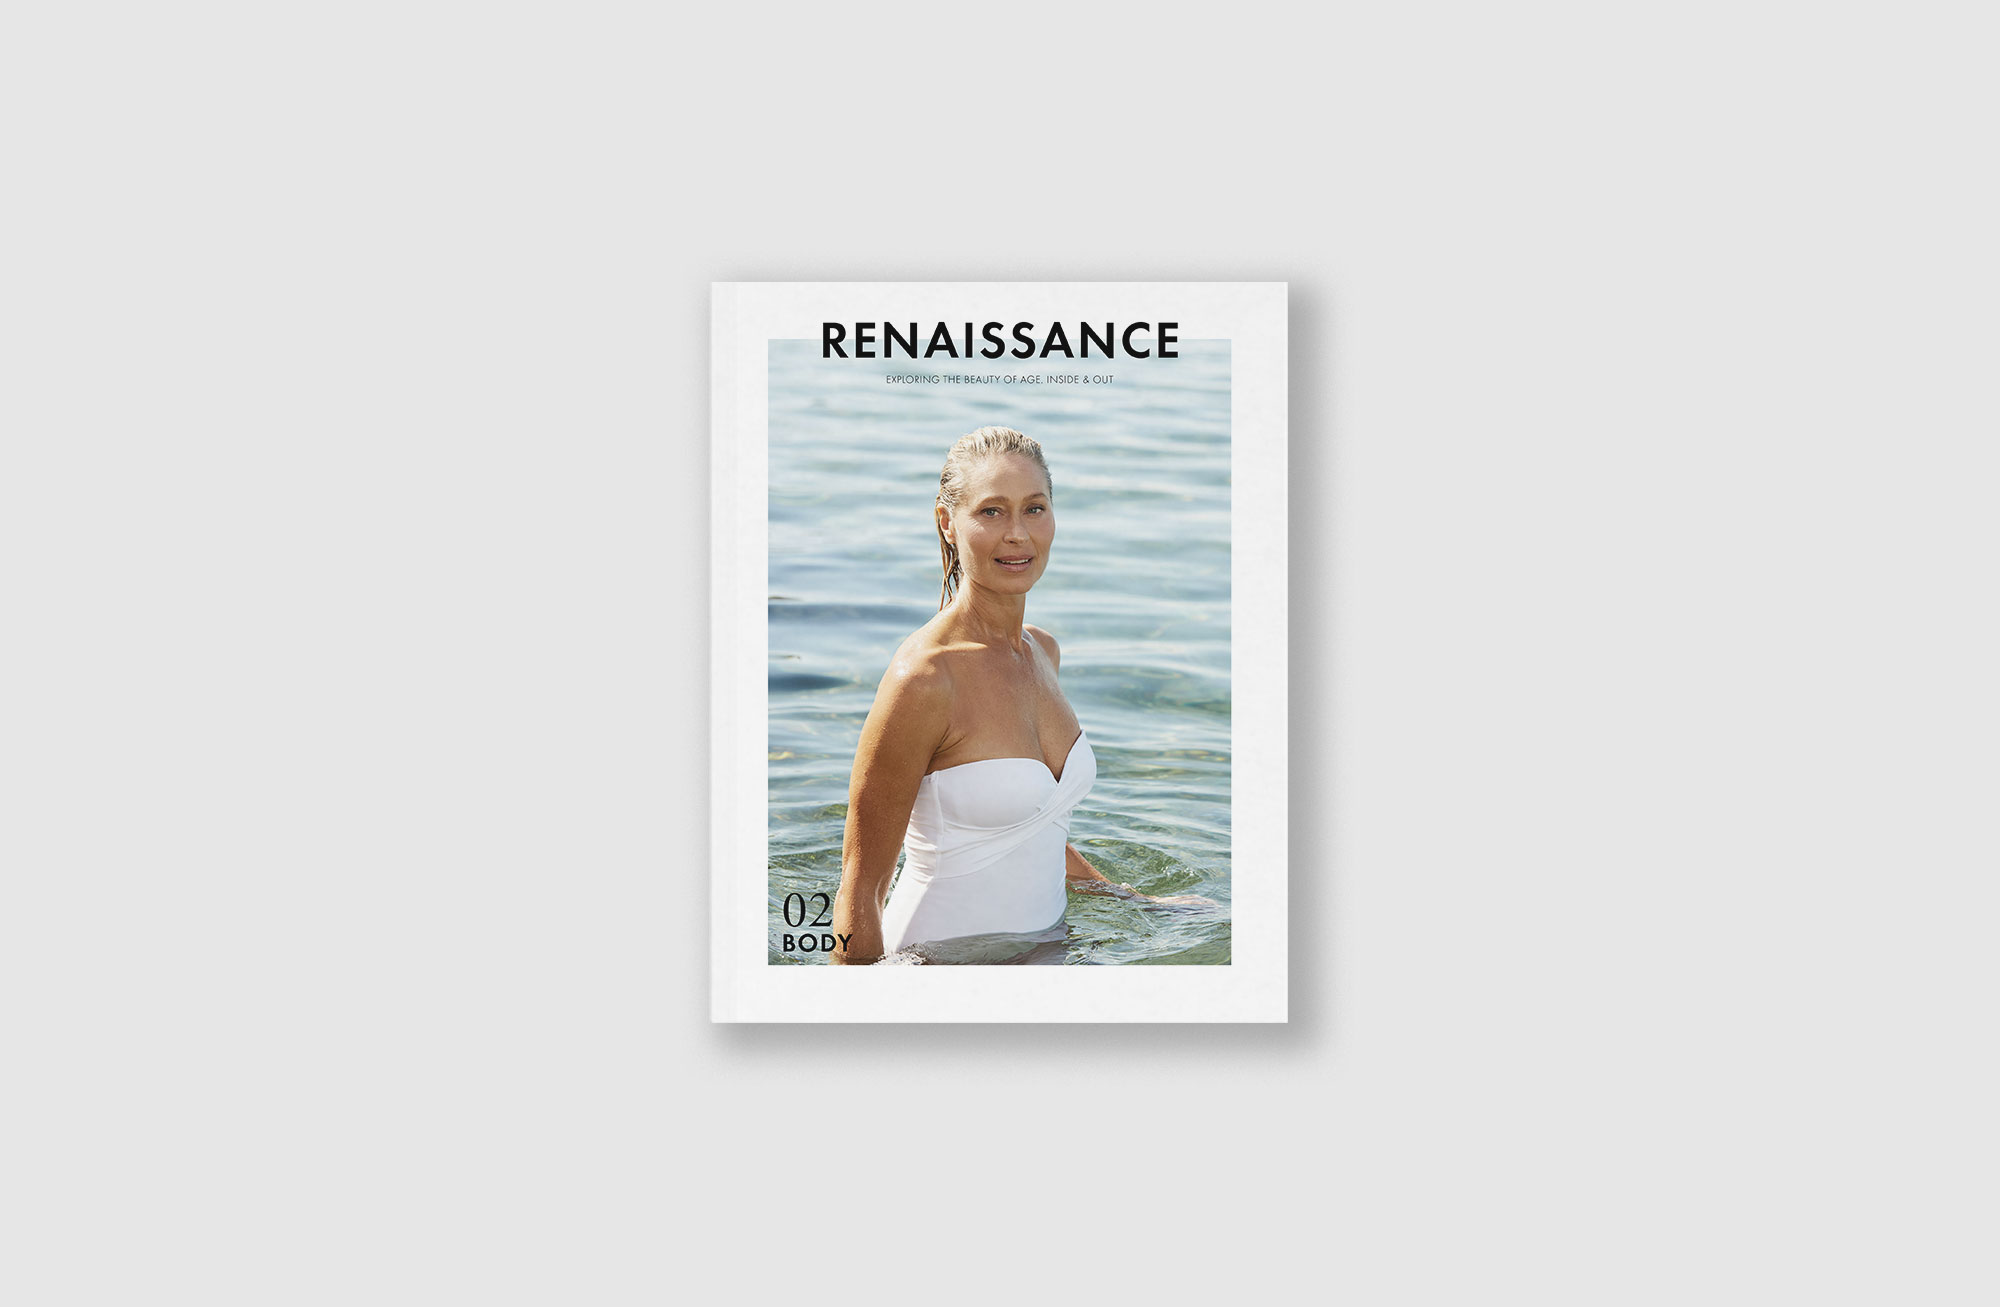 renaissance-02-1.jpg